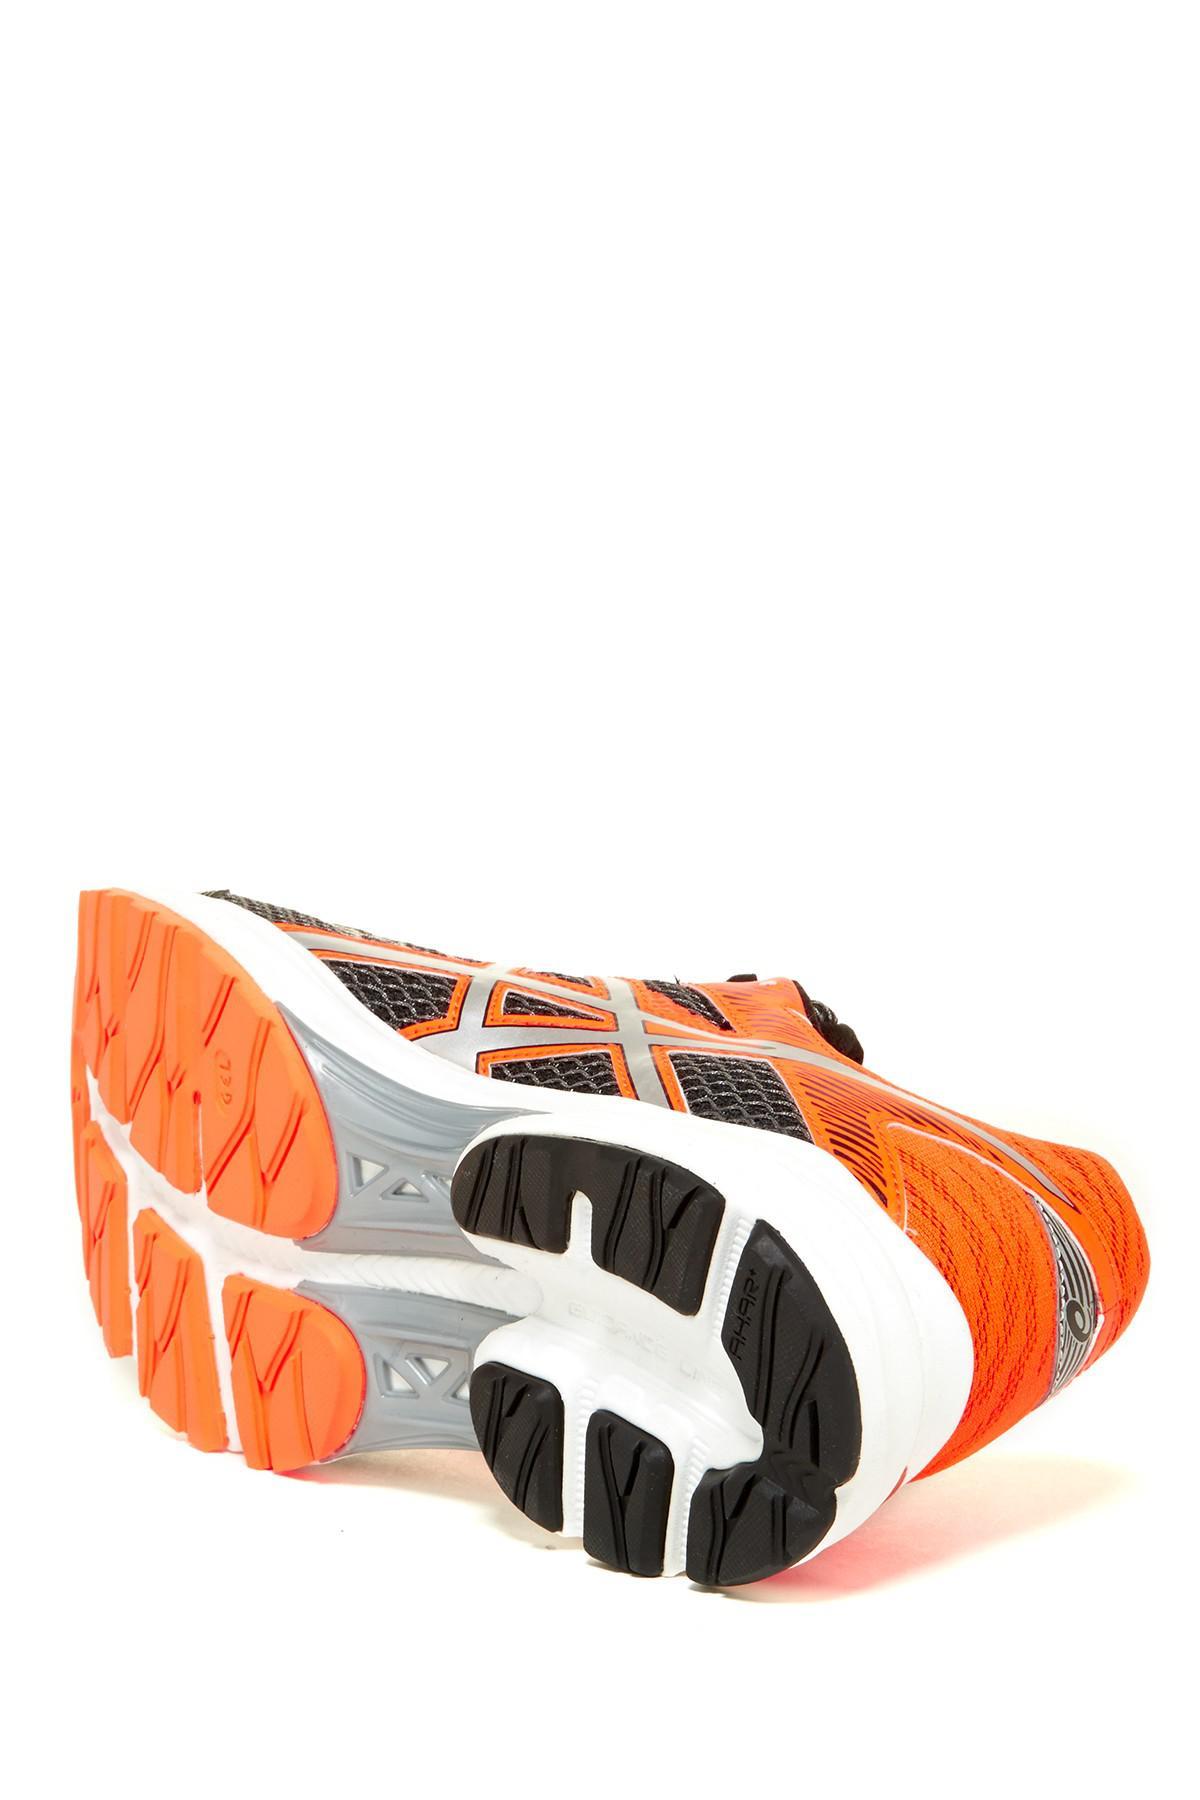 Sneaker Running Lyst Asics Gel Flux Sneaker Gel 4 Lyst pour Homme 4cf82ad - ringtonewebsite.info